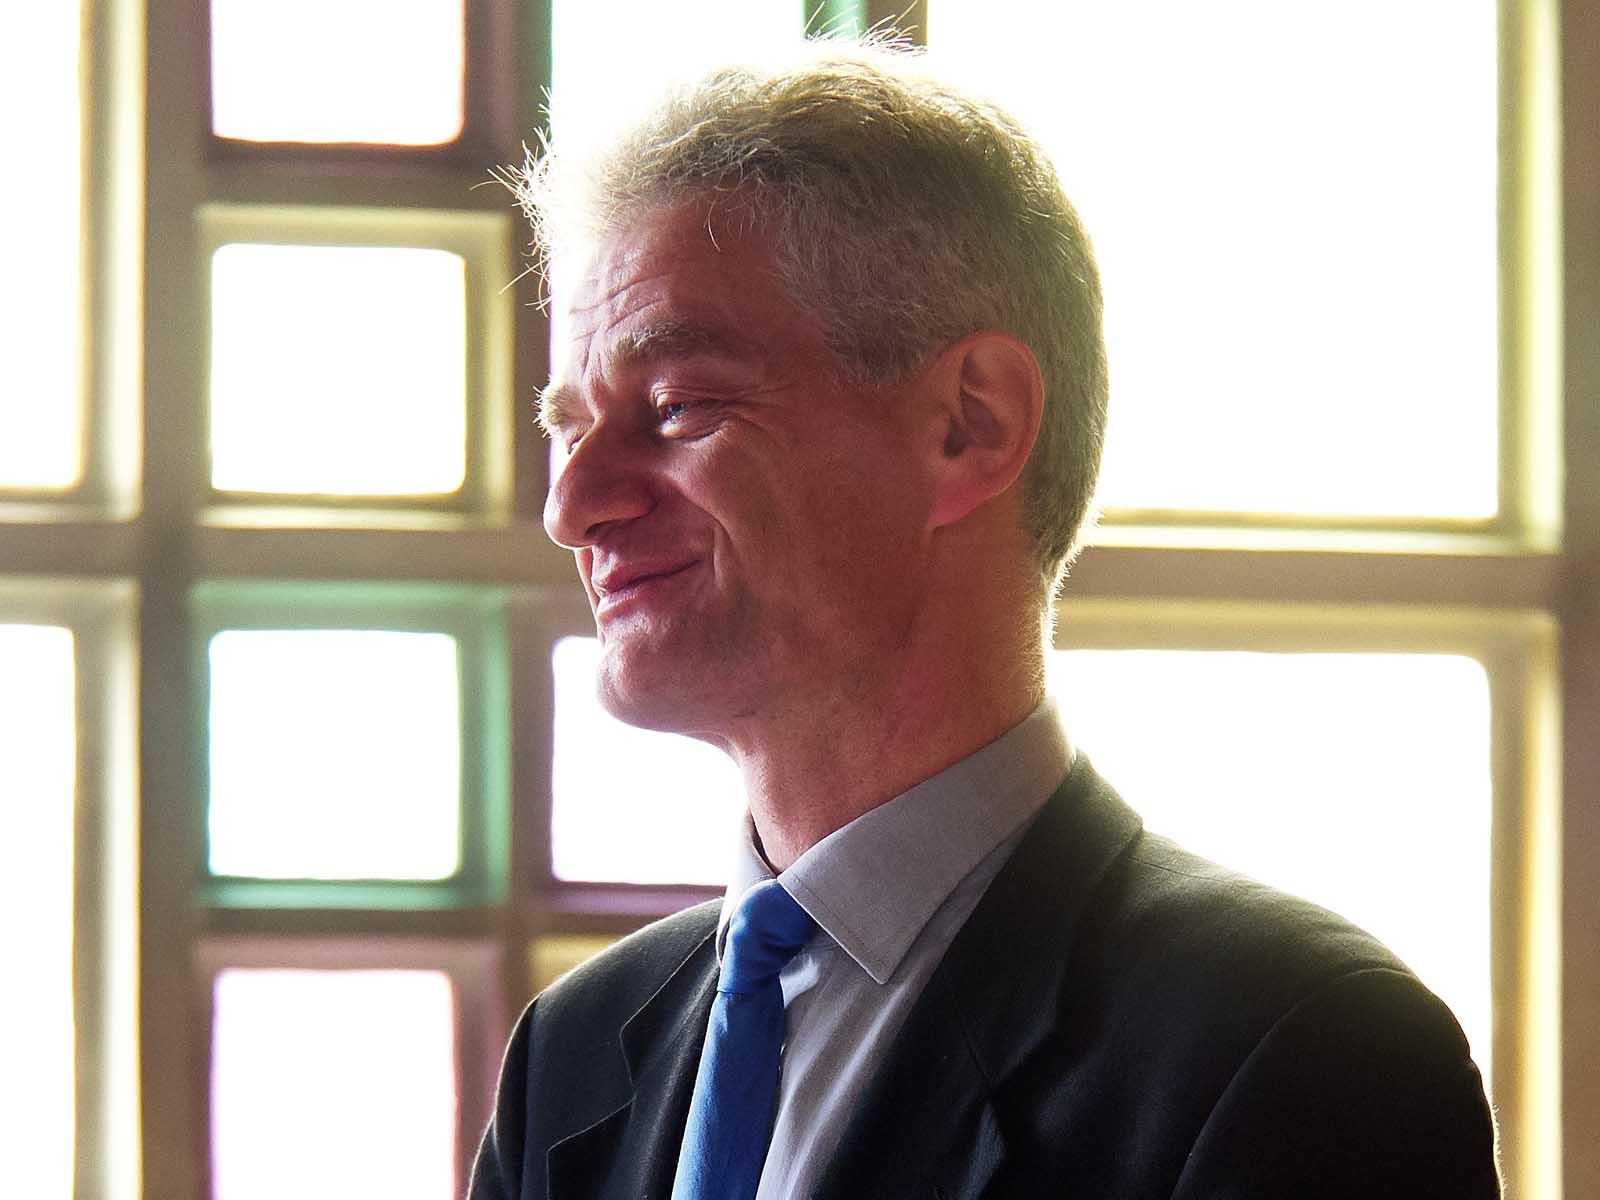 Pfarrer Samuel Zahn